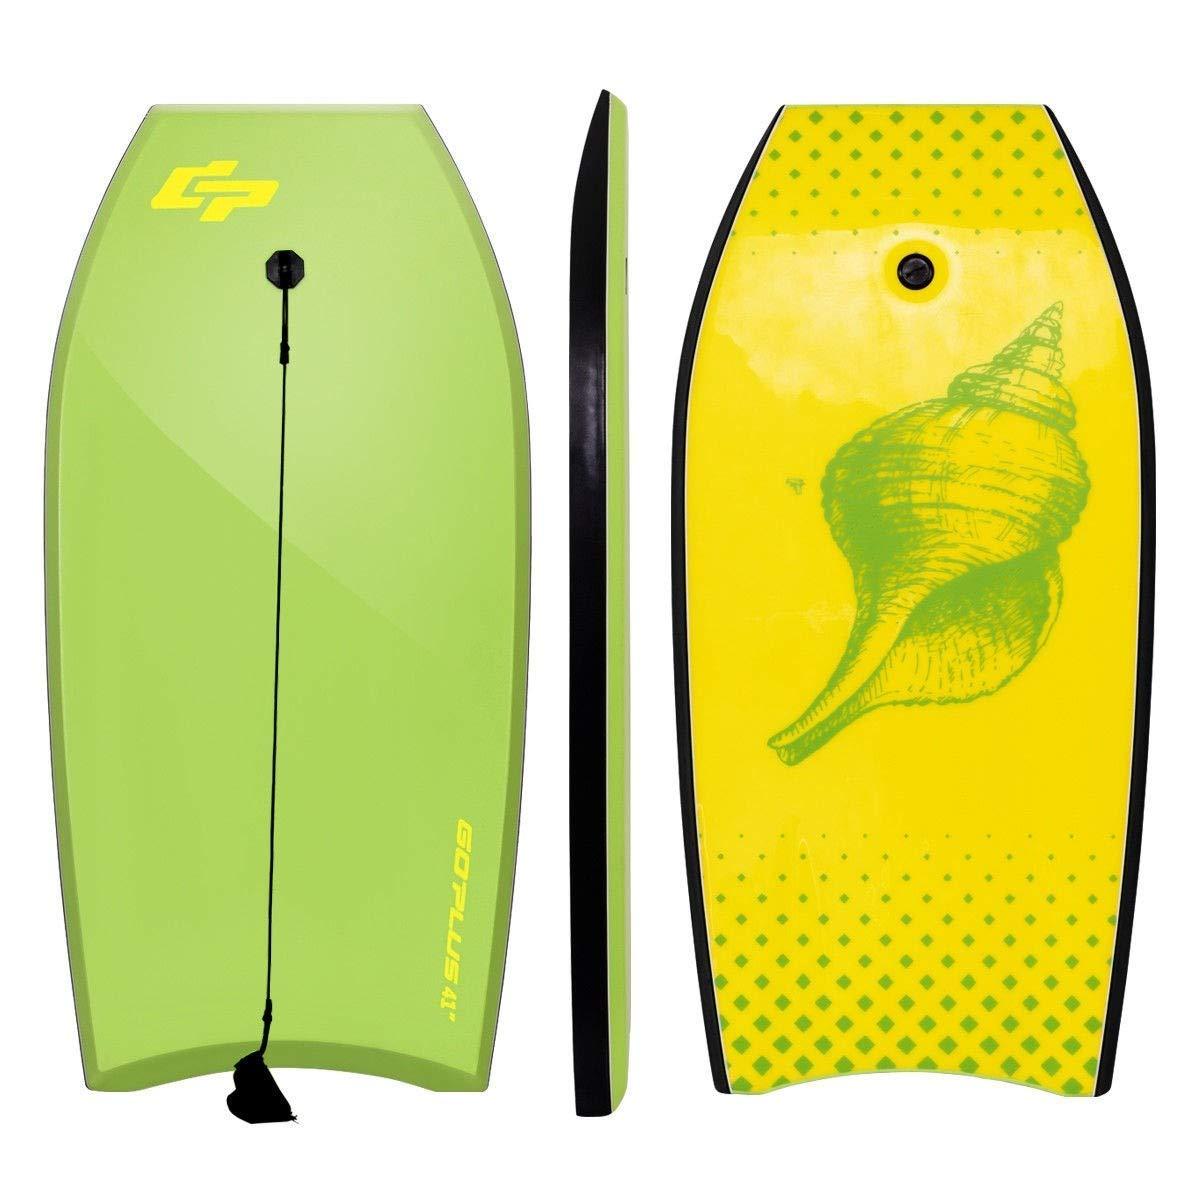 "BeUniqueToday 42"" Lightweight Super Bodyboard Surfing w/Leash IXPE Deck EPS Core Boarding, Durable and Buoyant Bodyboard Surfing w/Leash IXPE Deck EPS Core Boarding, 42"" Lightweight Super Bodyboard"